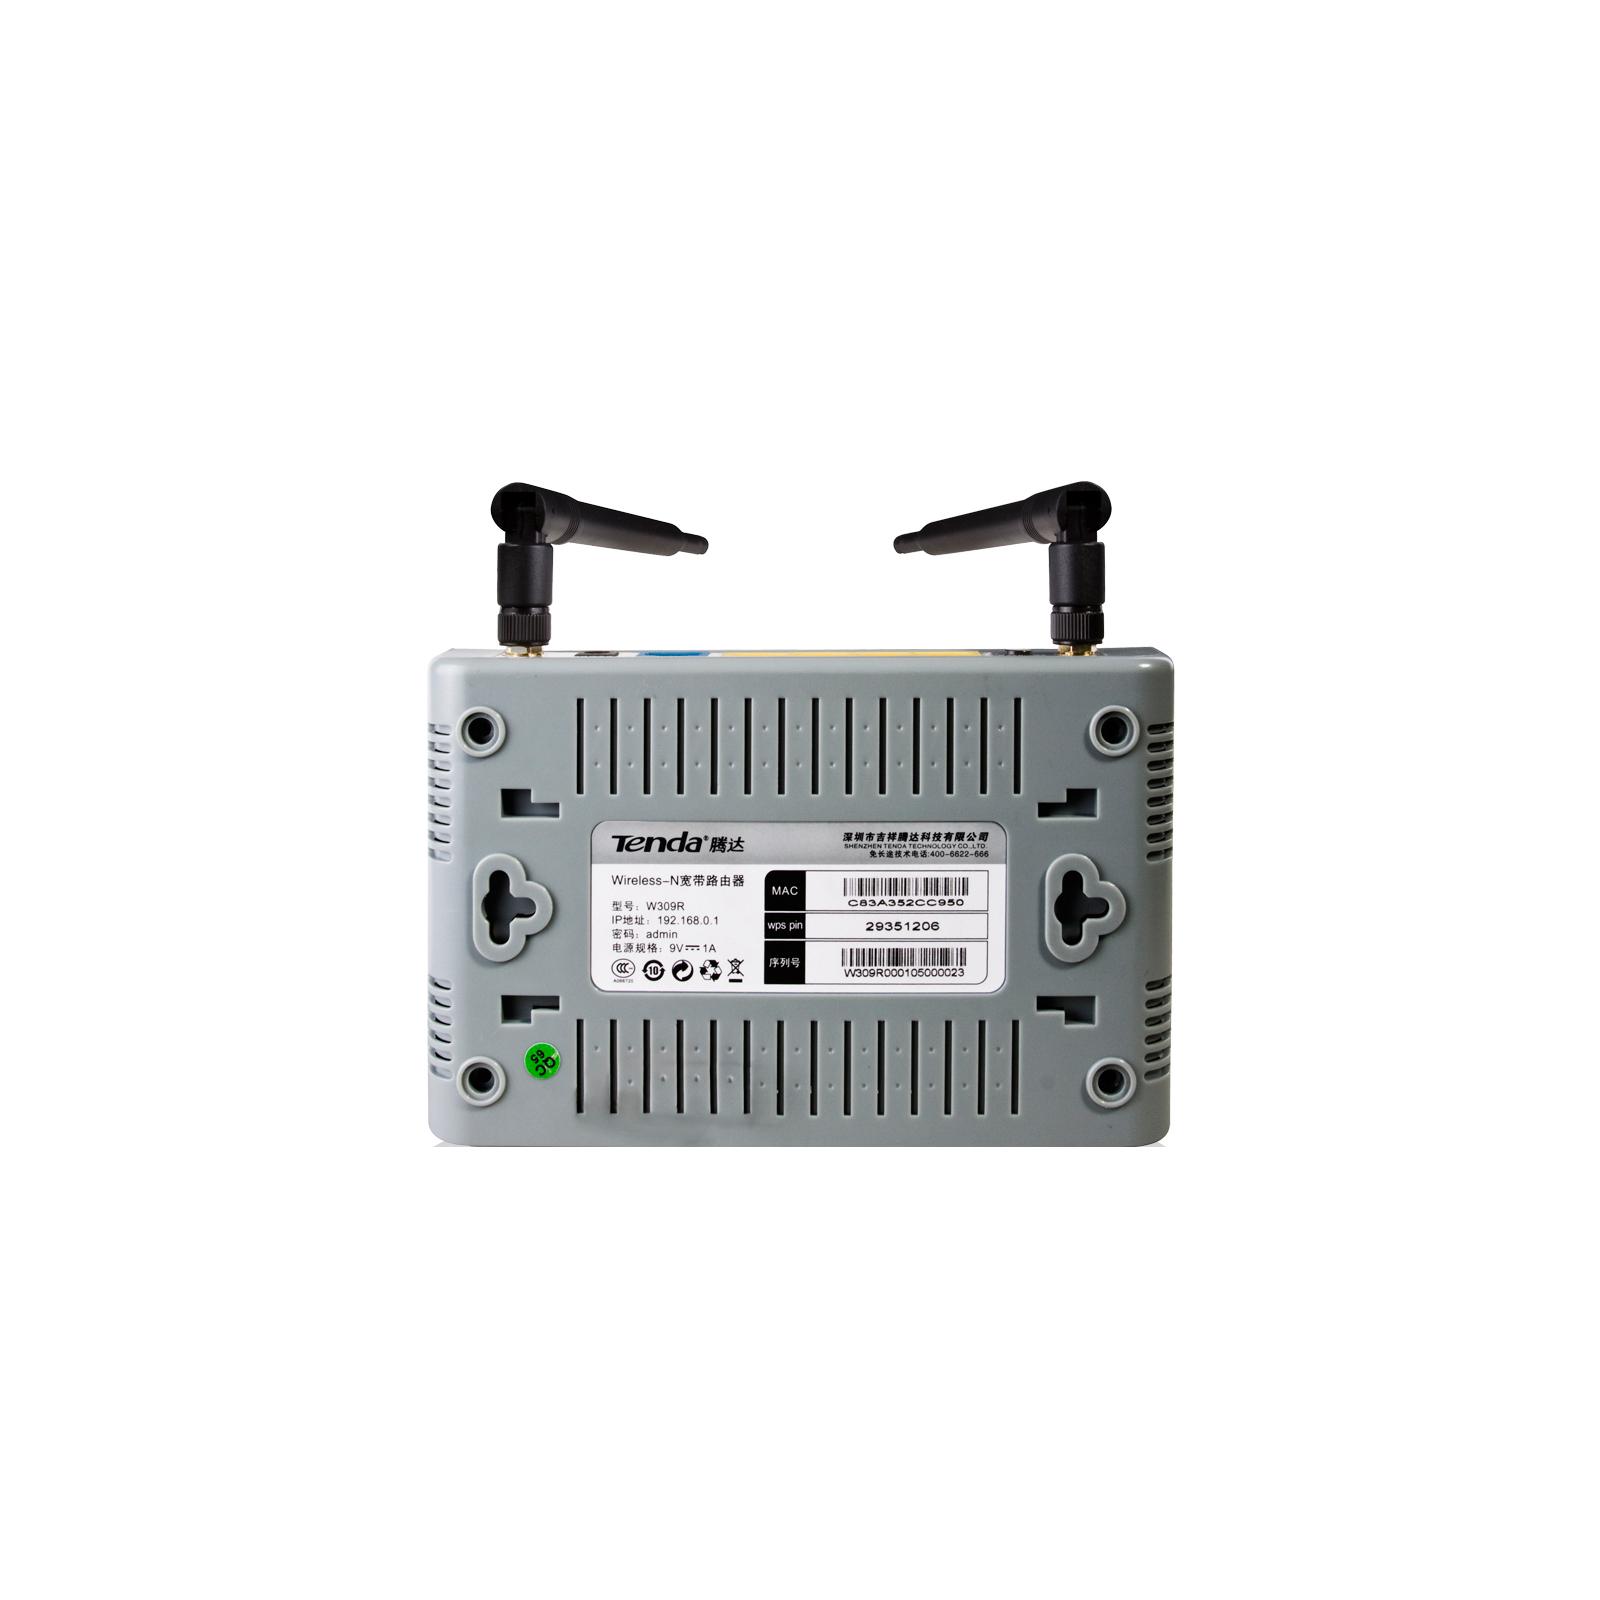 Маршрутизатор TENDA W309R+ изображение 6